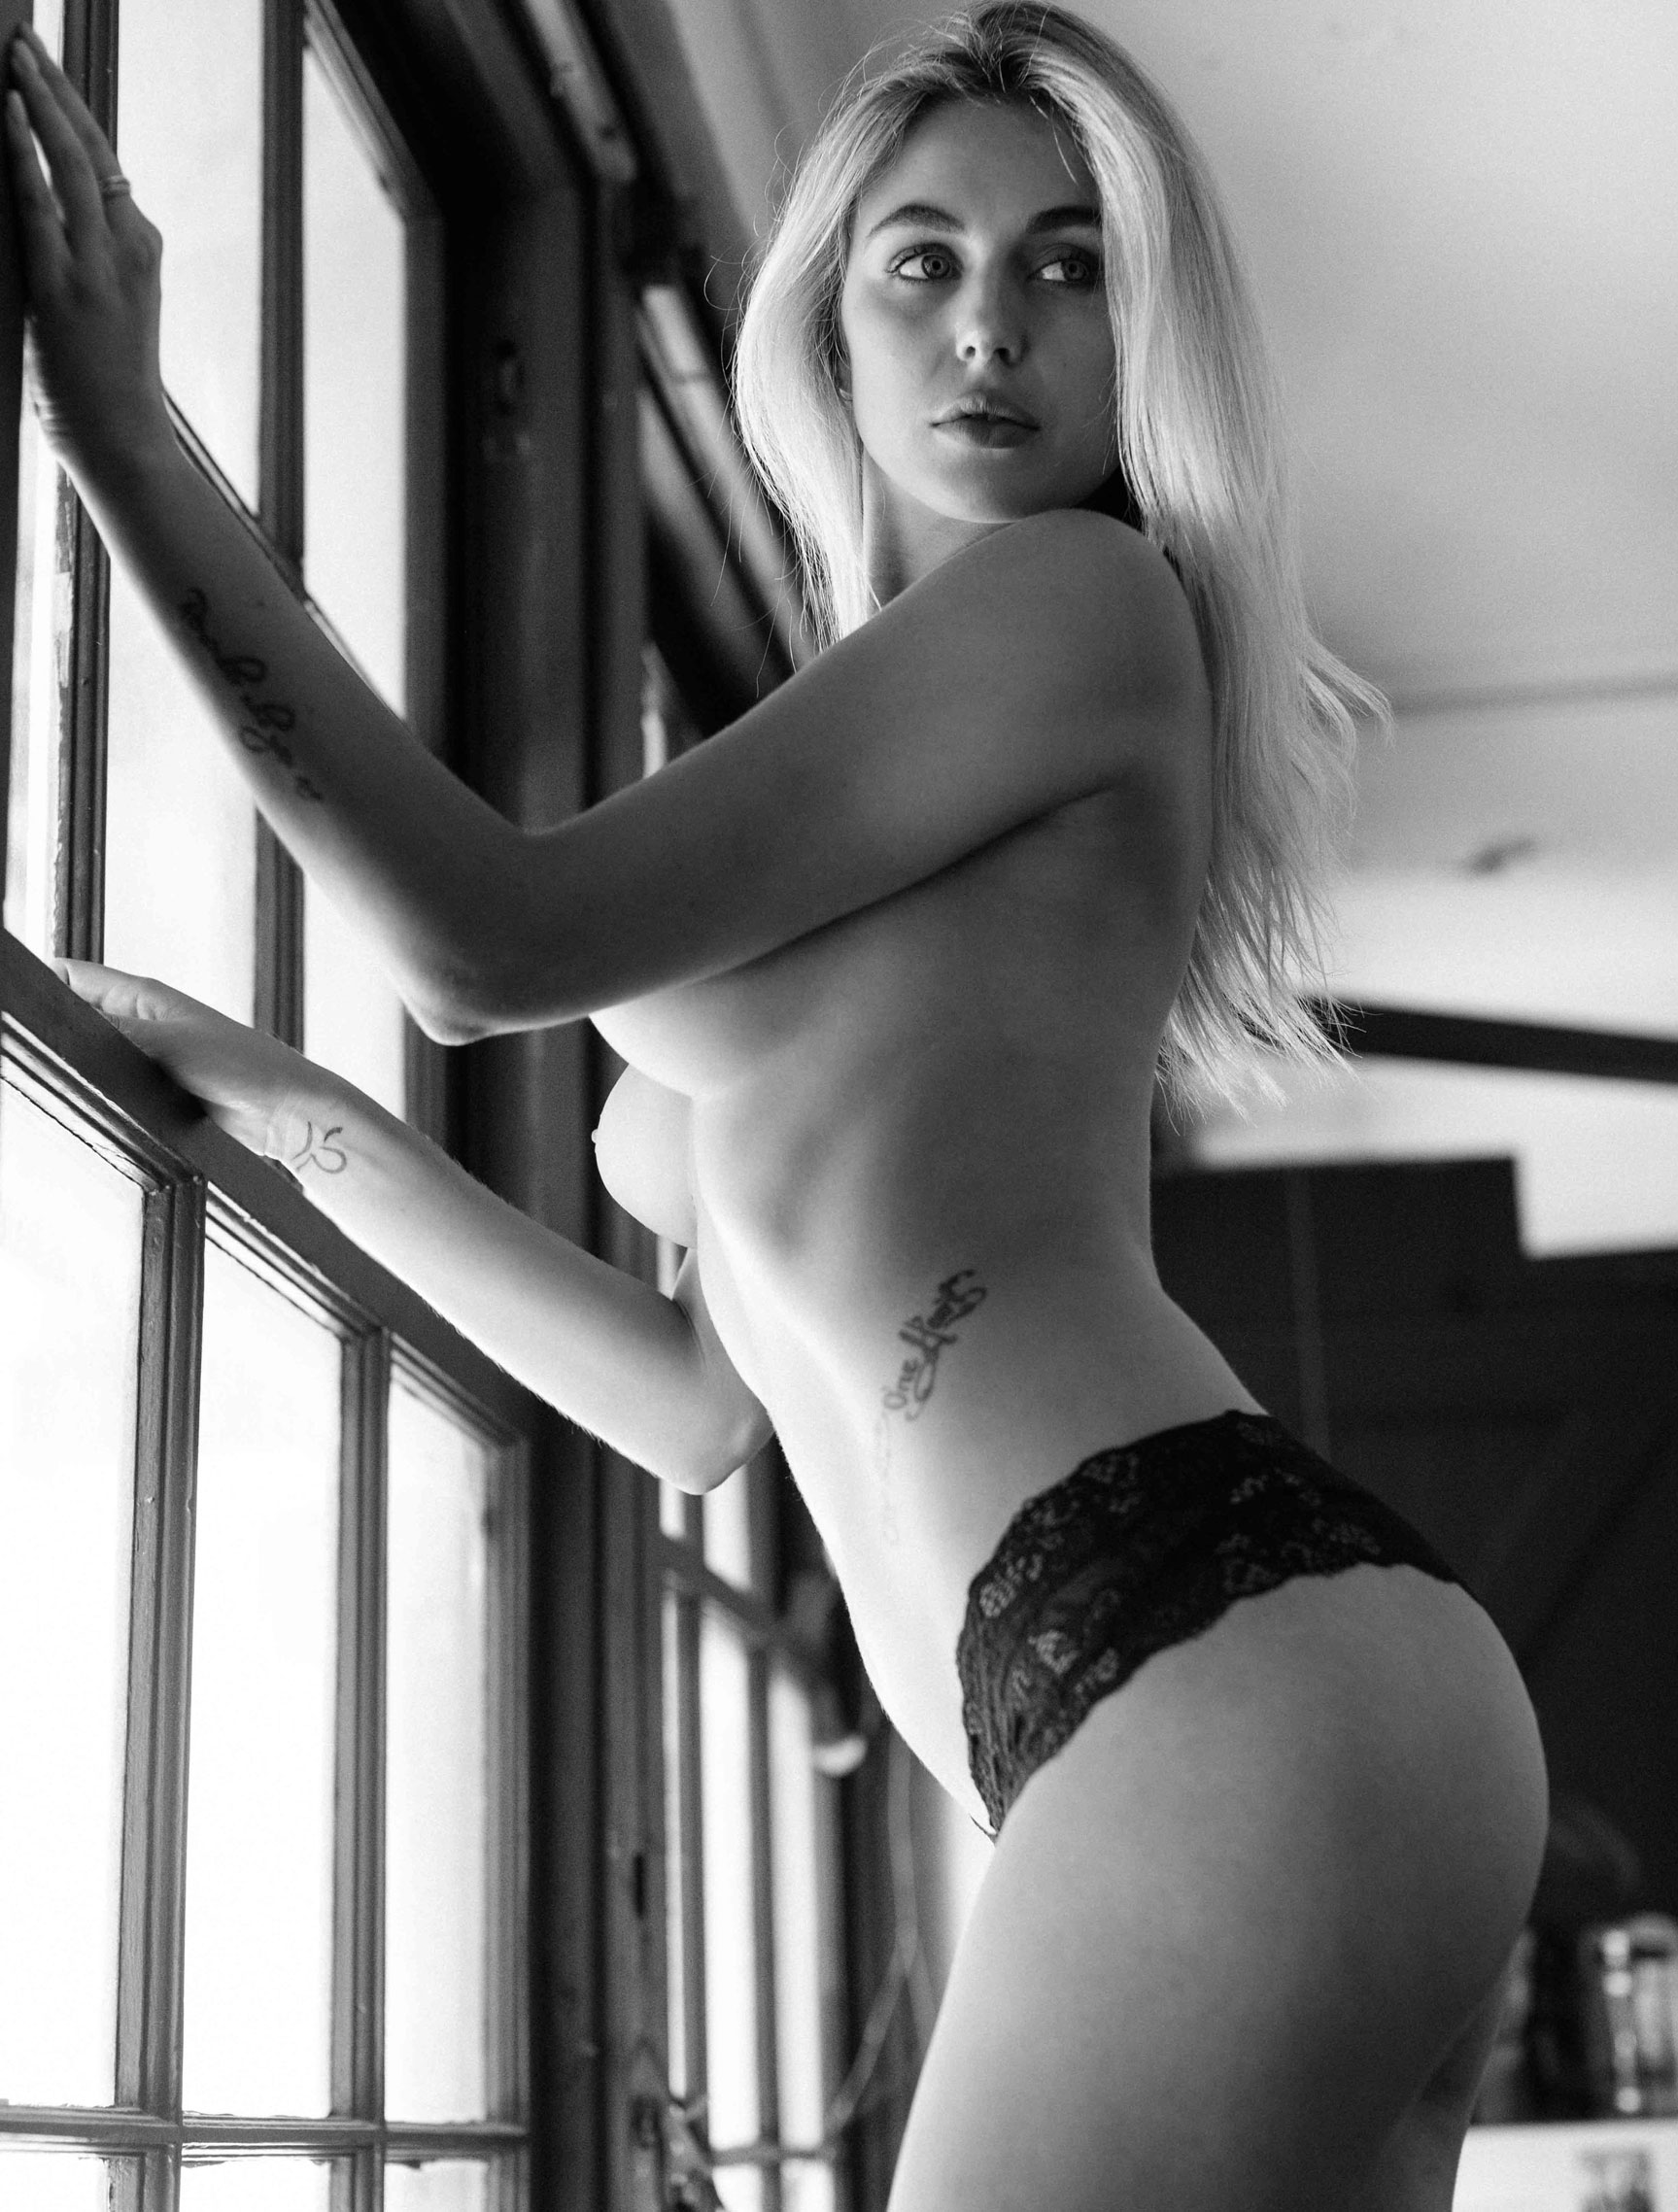 Paige Marie Evans nude by Paul McMahon / Break the Norm